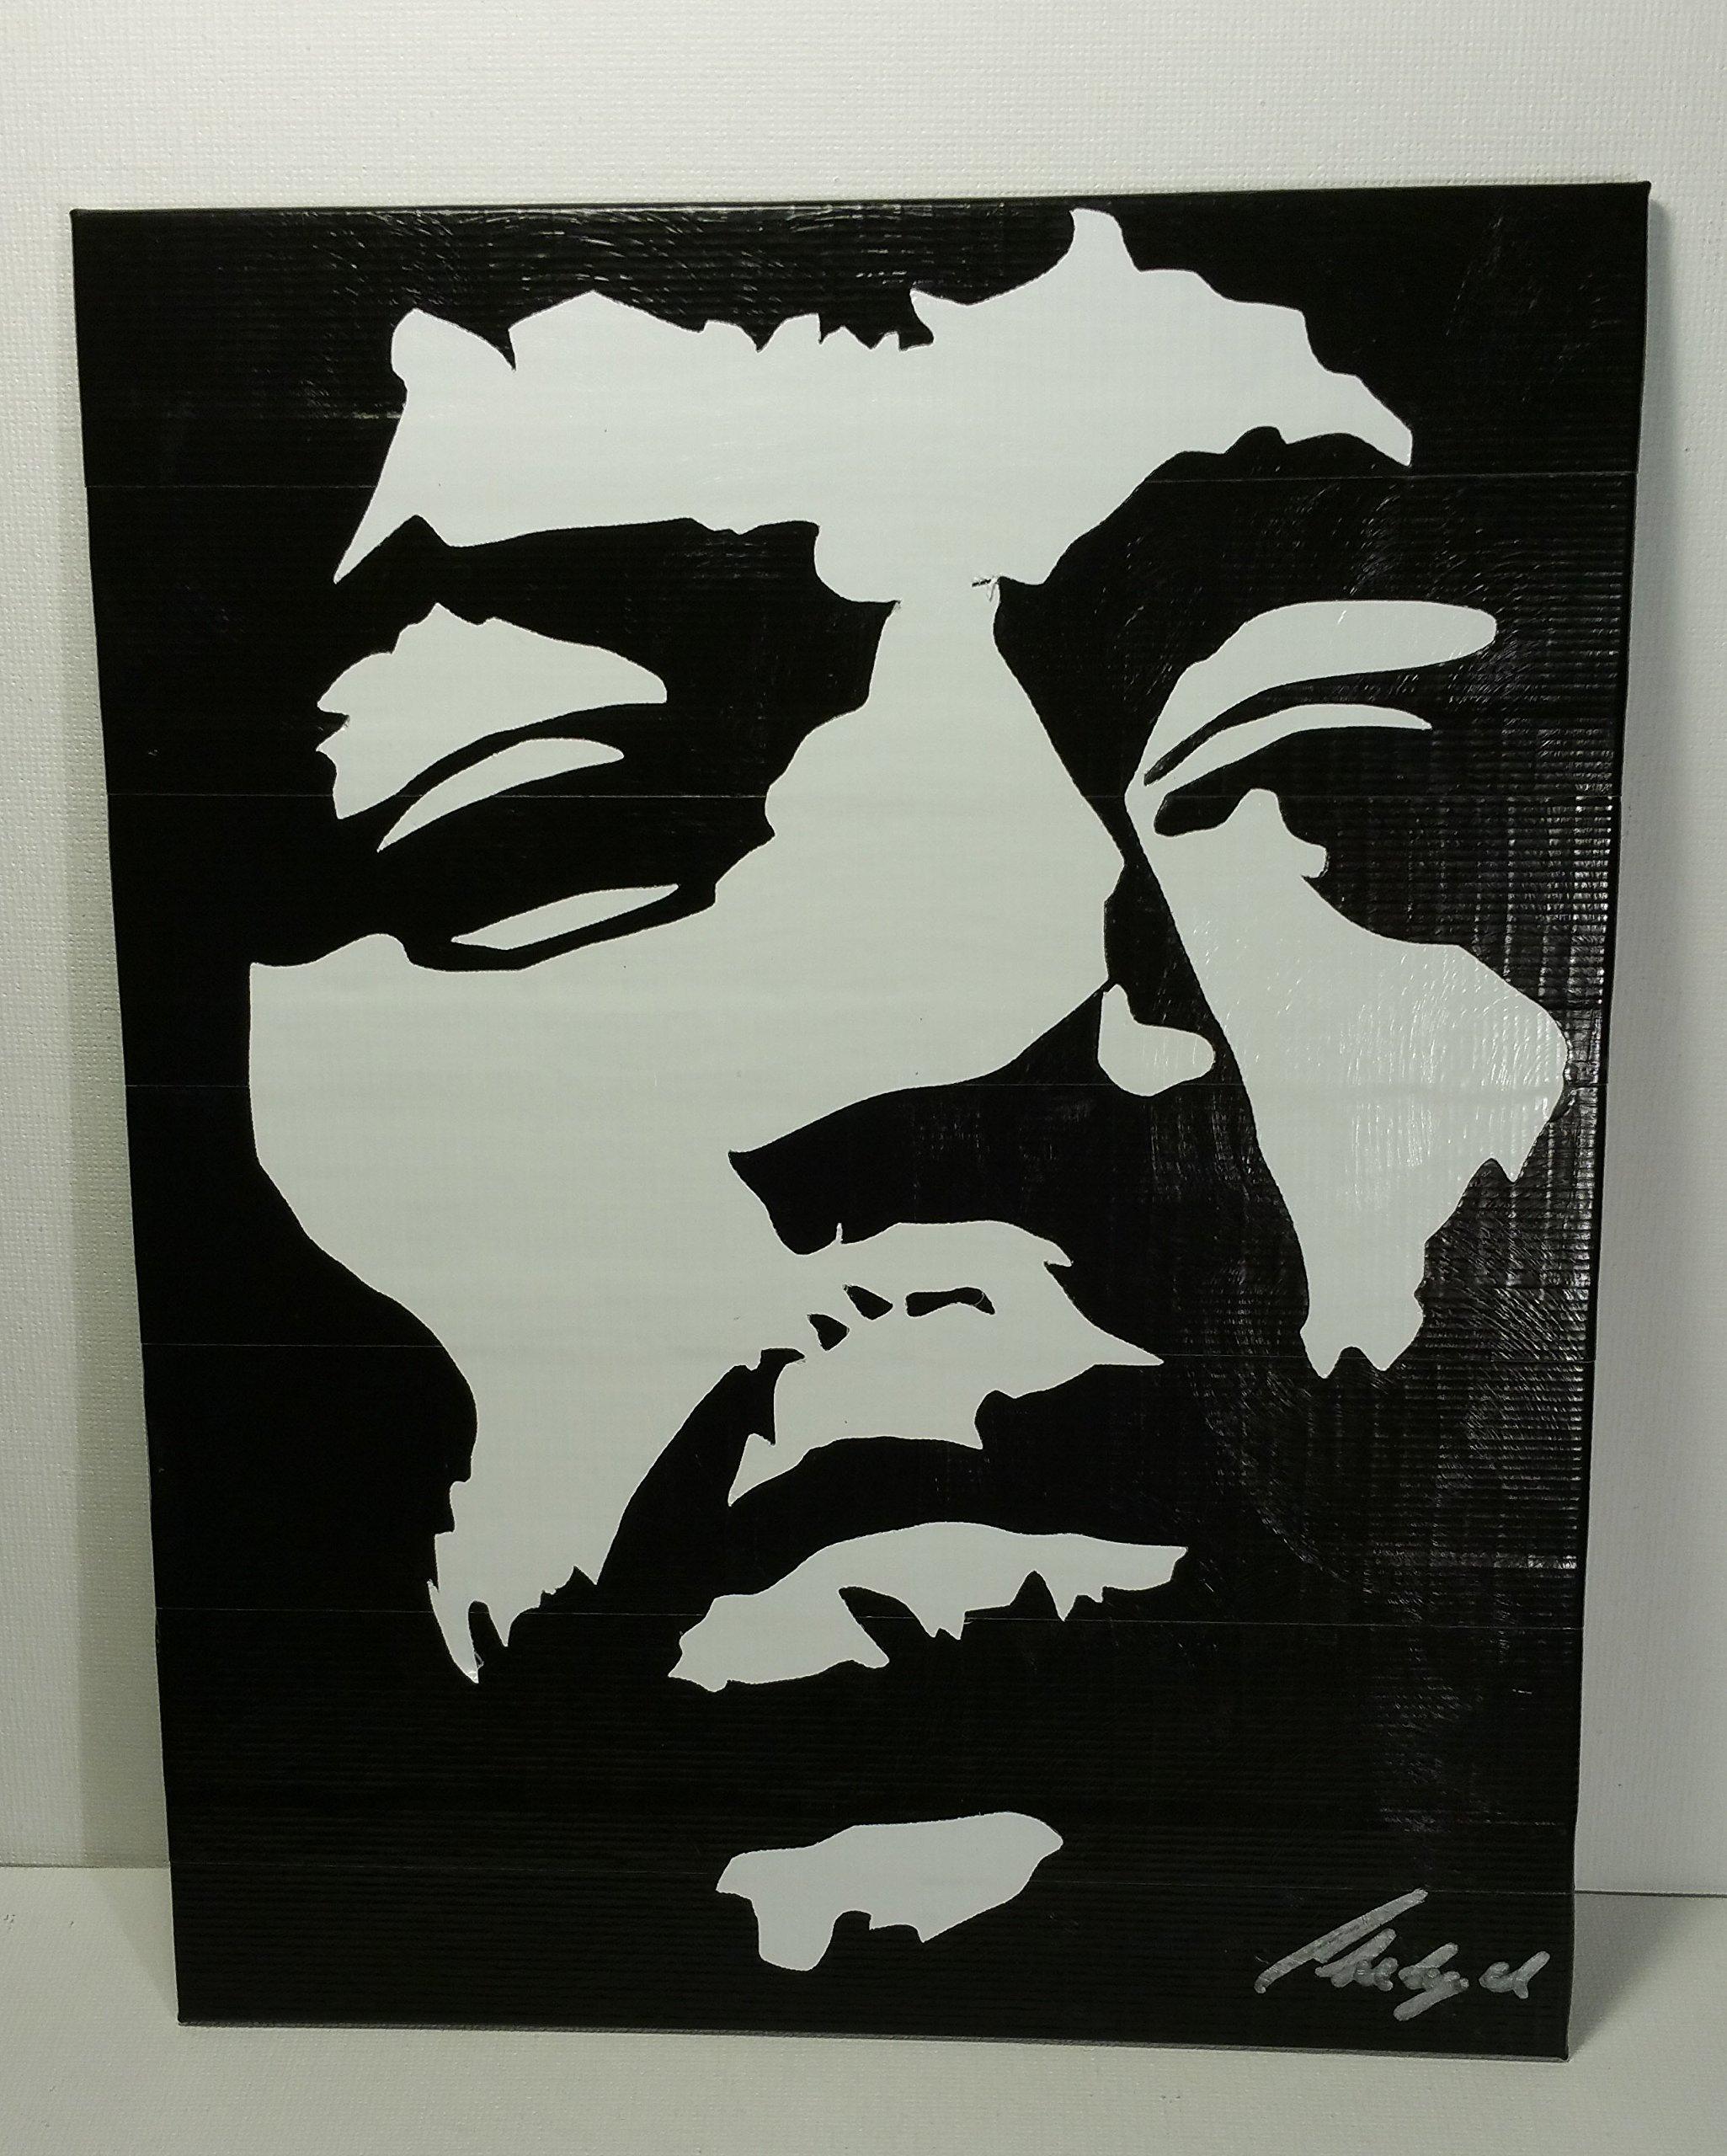 Duct Tape and Vinyl Art Piece of Jimi Hendrix